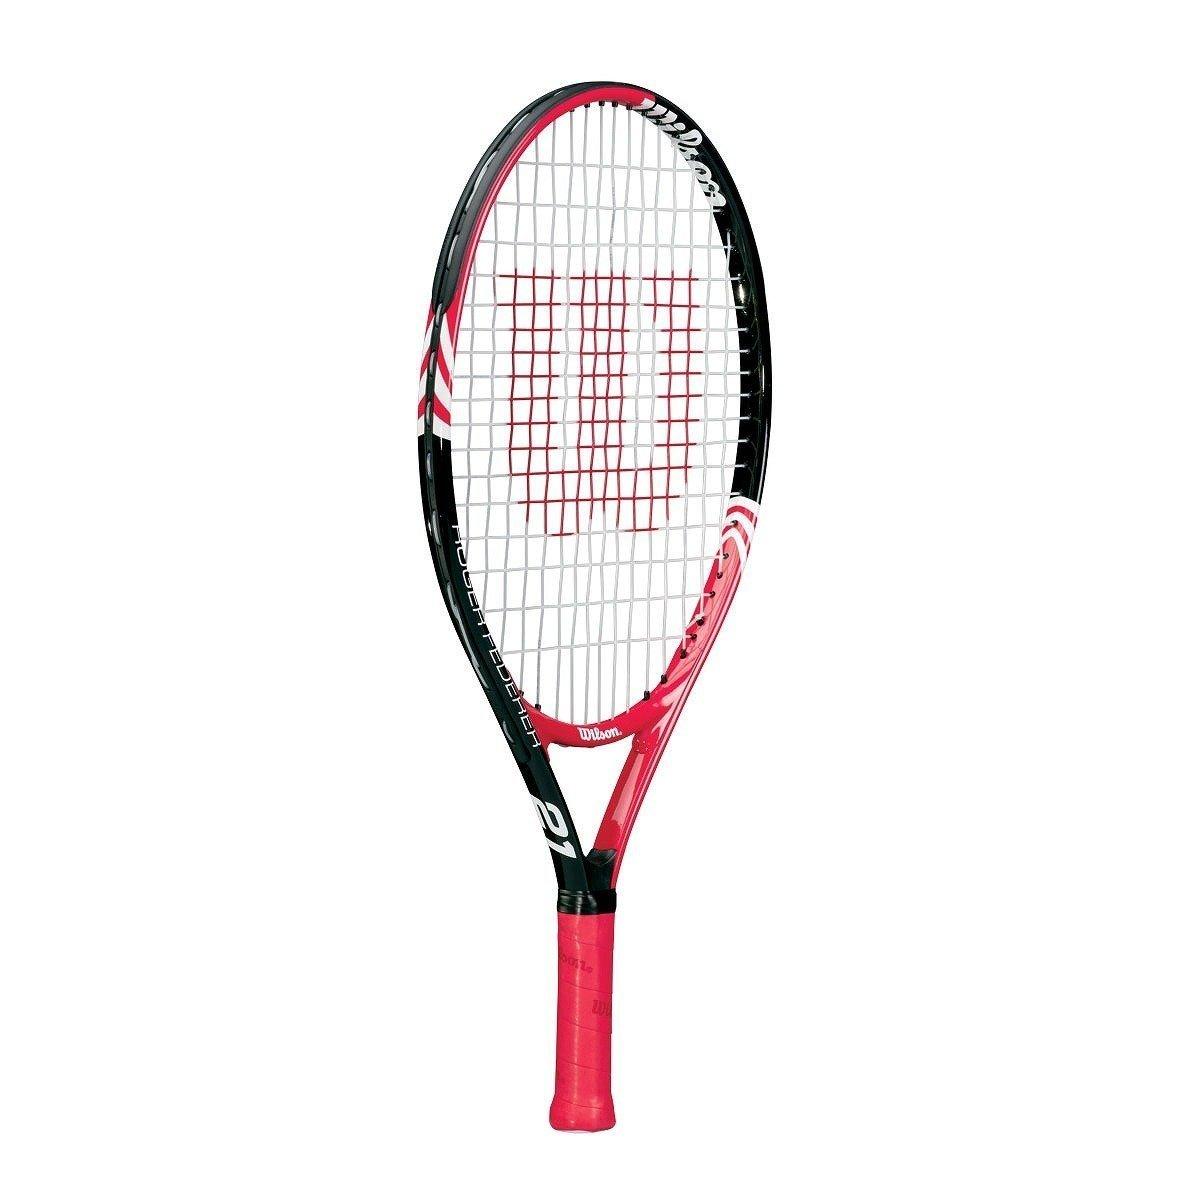 "Wilson roger federer 21"" junior tennisketcher fra Wilson tennis fra billigsport24"